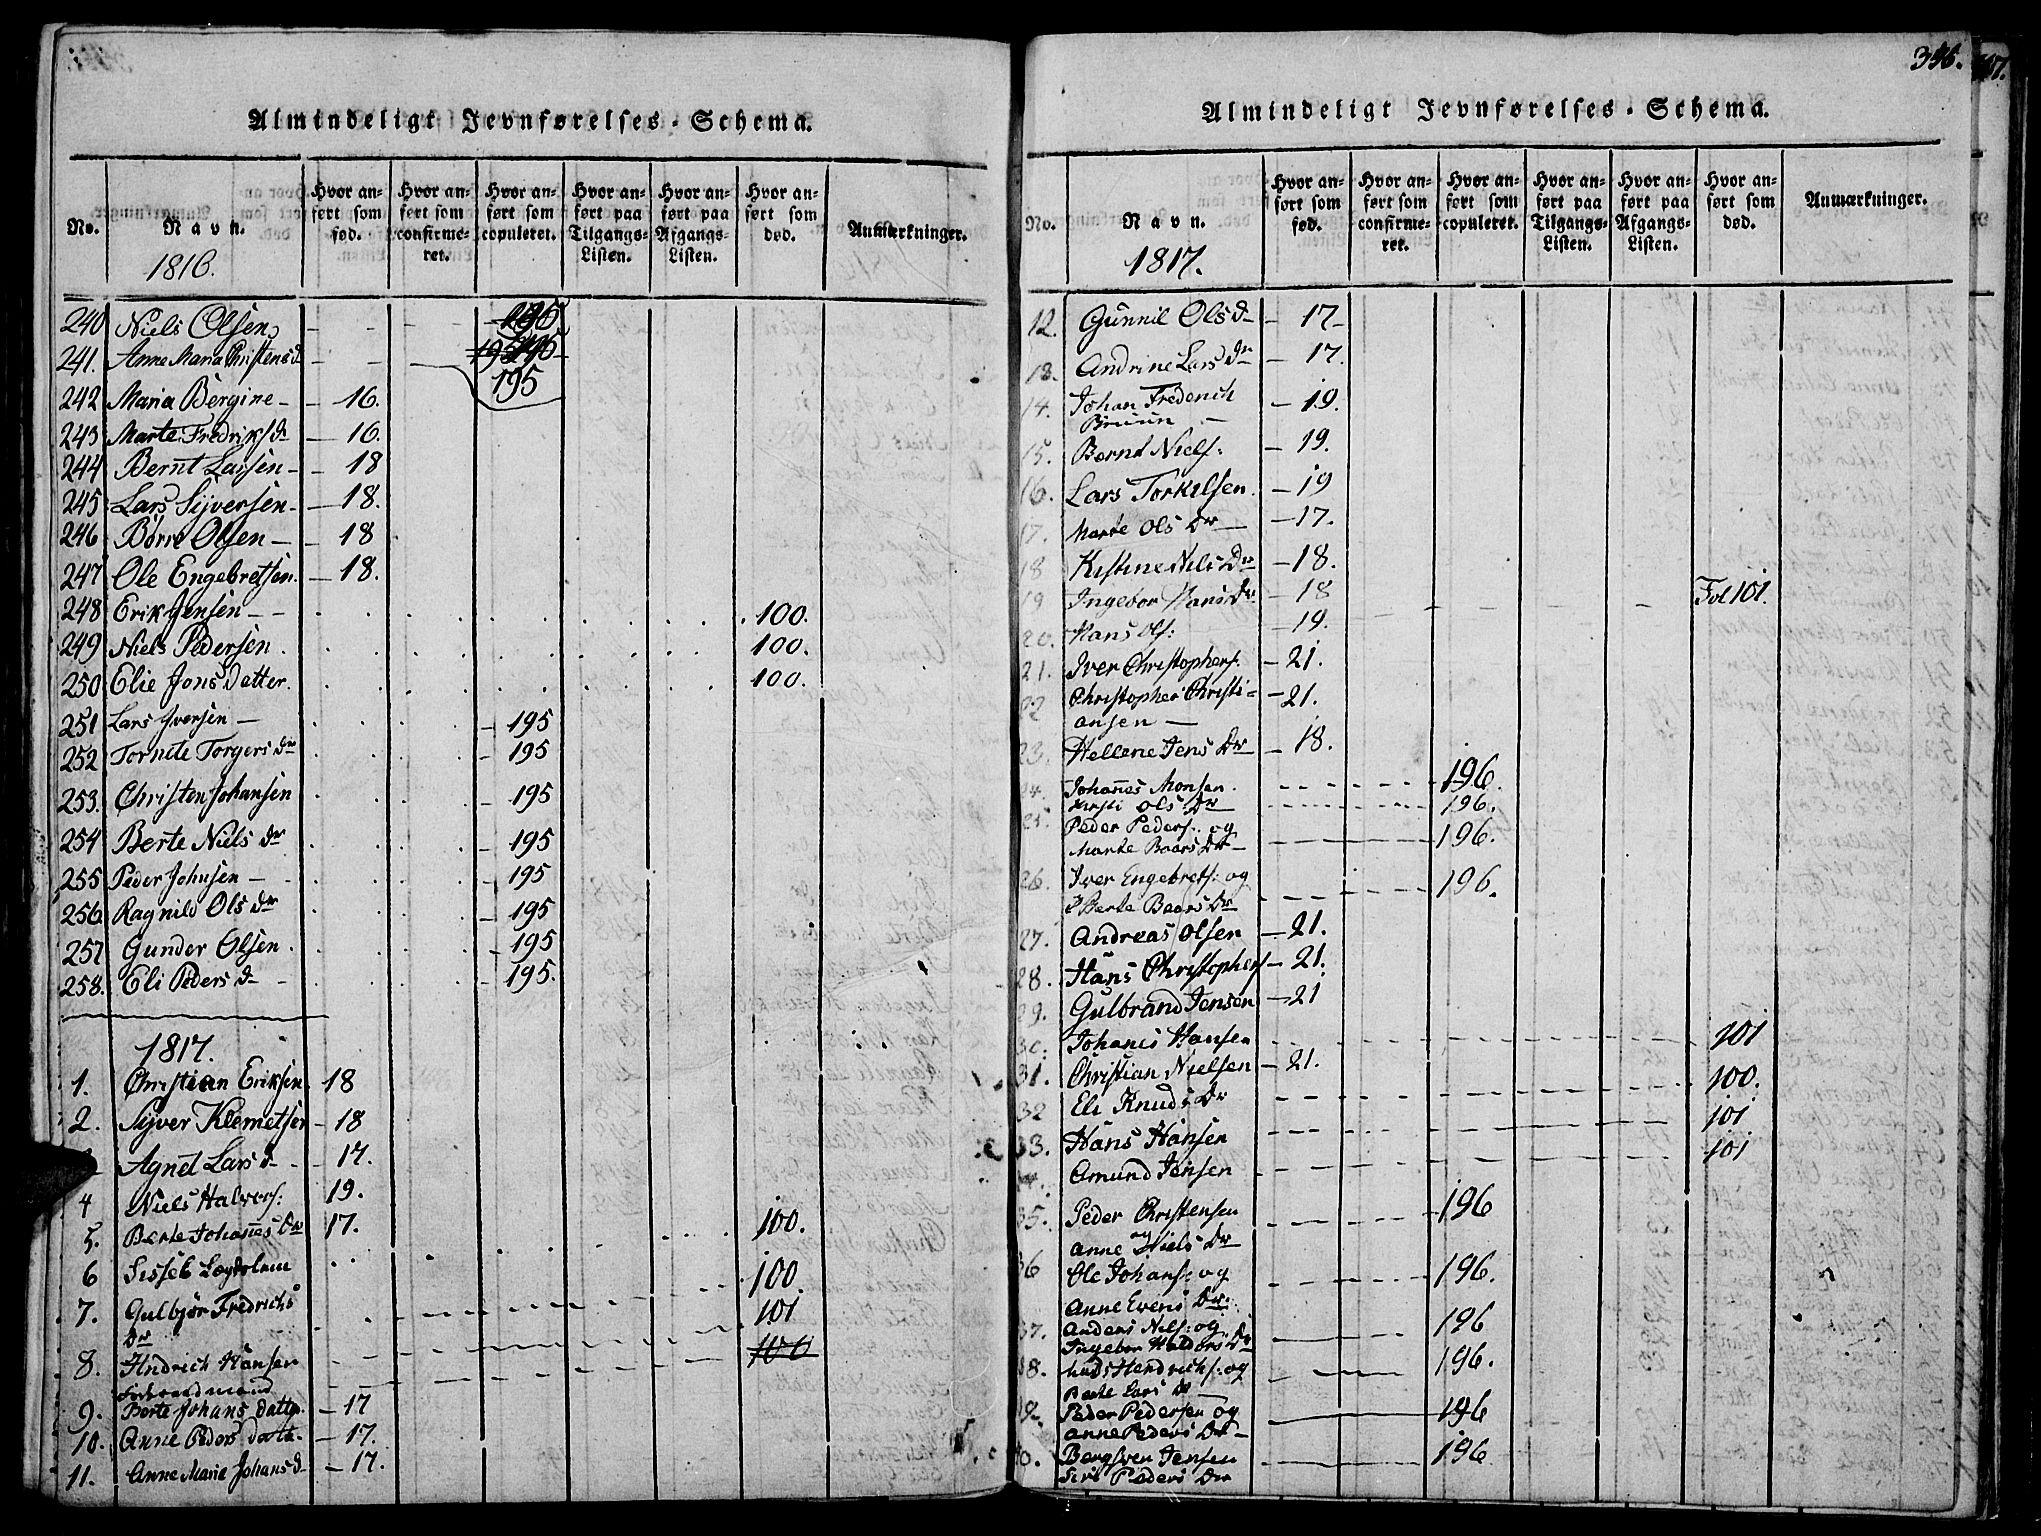 SAH, Biri prestekontor, Ministerialbok nr. 3, 1814-1828, s. 346